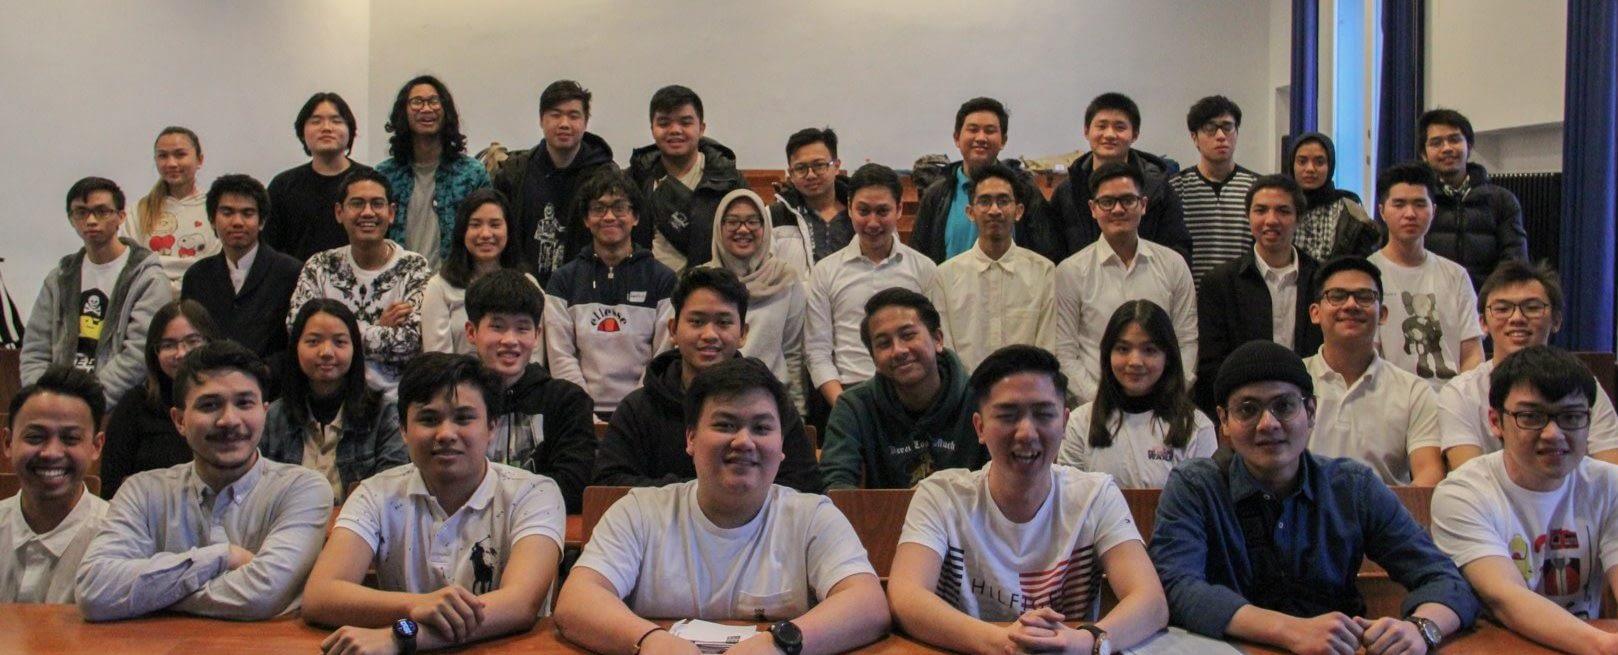 Foto bersama peserta TO ANP